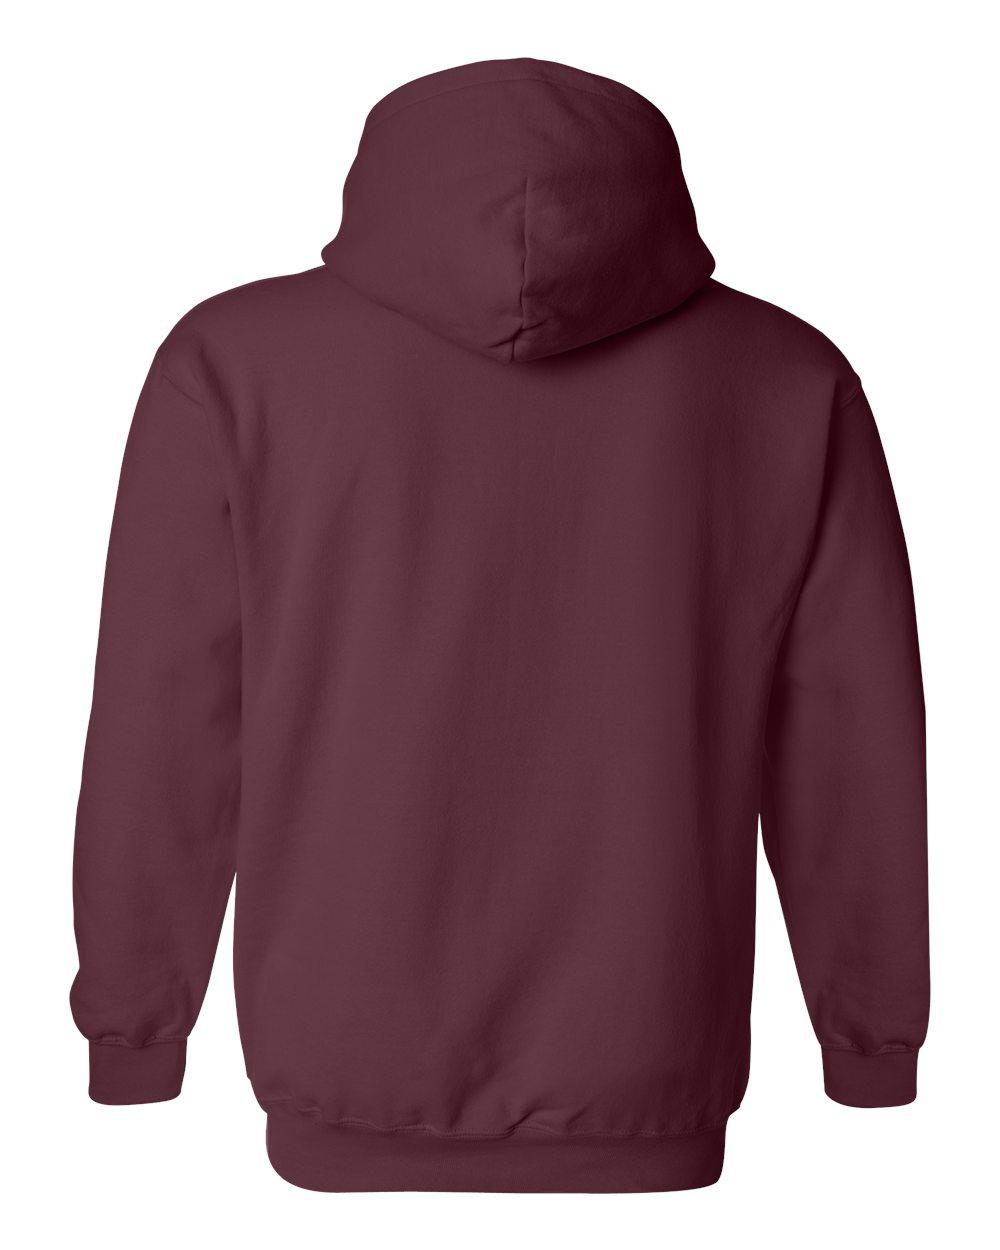 Gildan-Mens-Blank-Hoodie-Heavy-Blend-Hooded-Sweatshirt-Solid-18500-up-to-5XL thumbnail 57